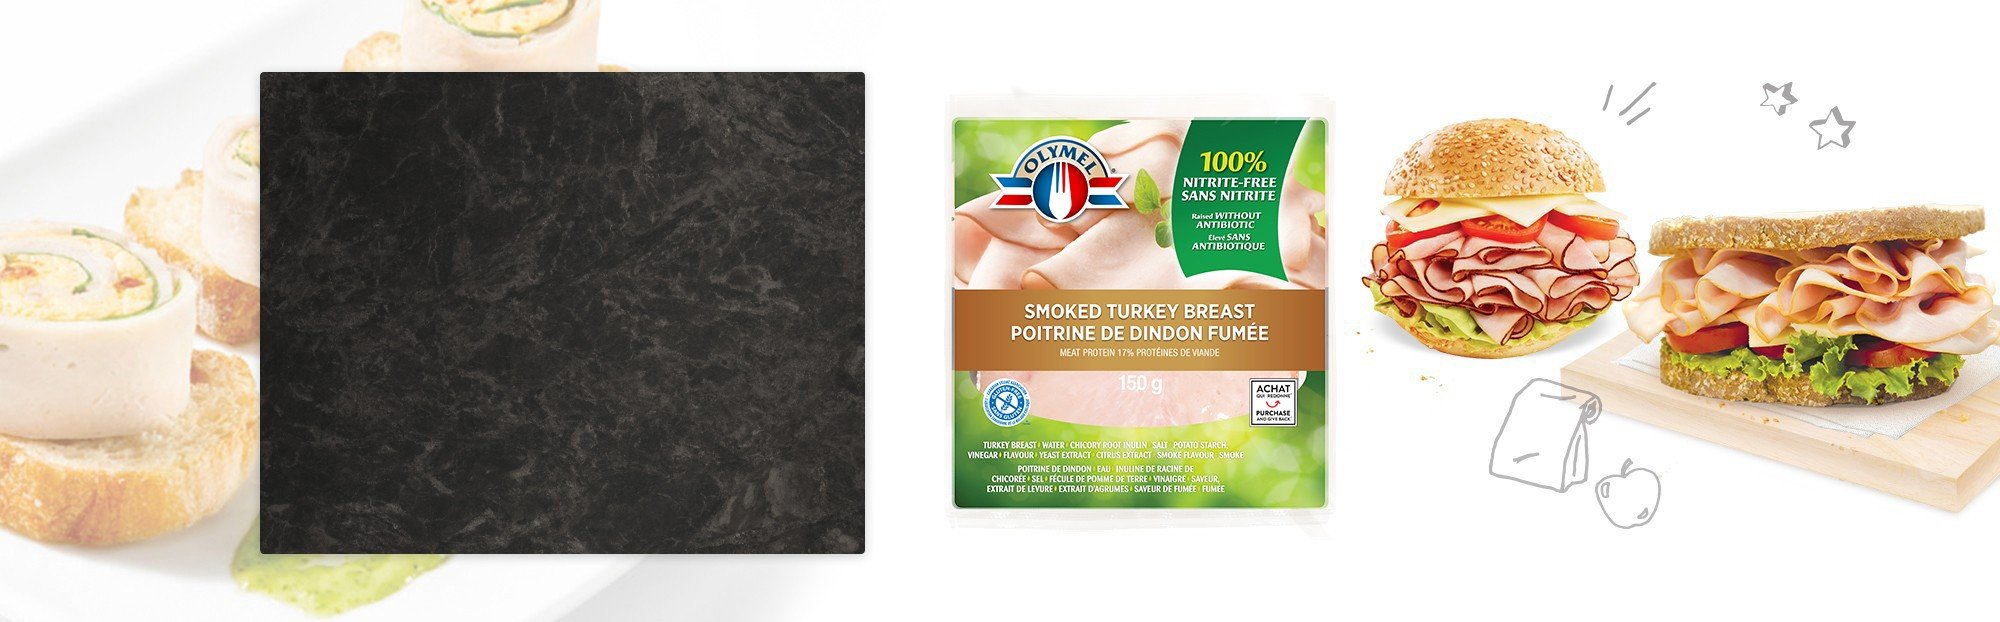 Smoked Turkey Breast, nitrite-free